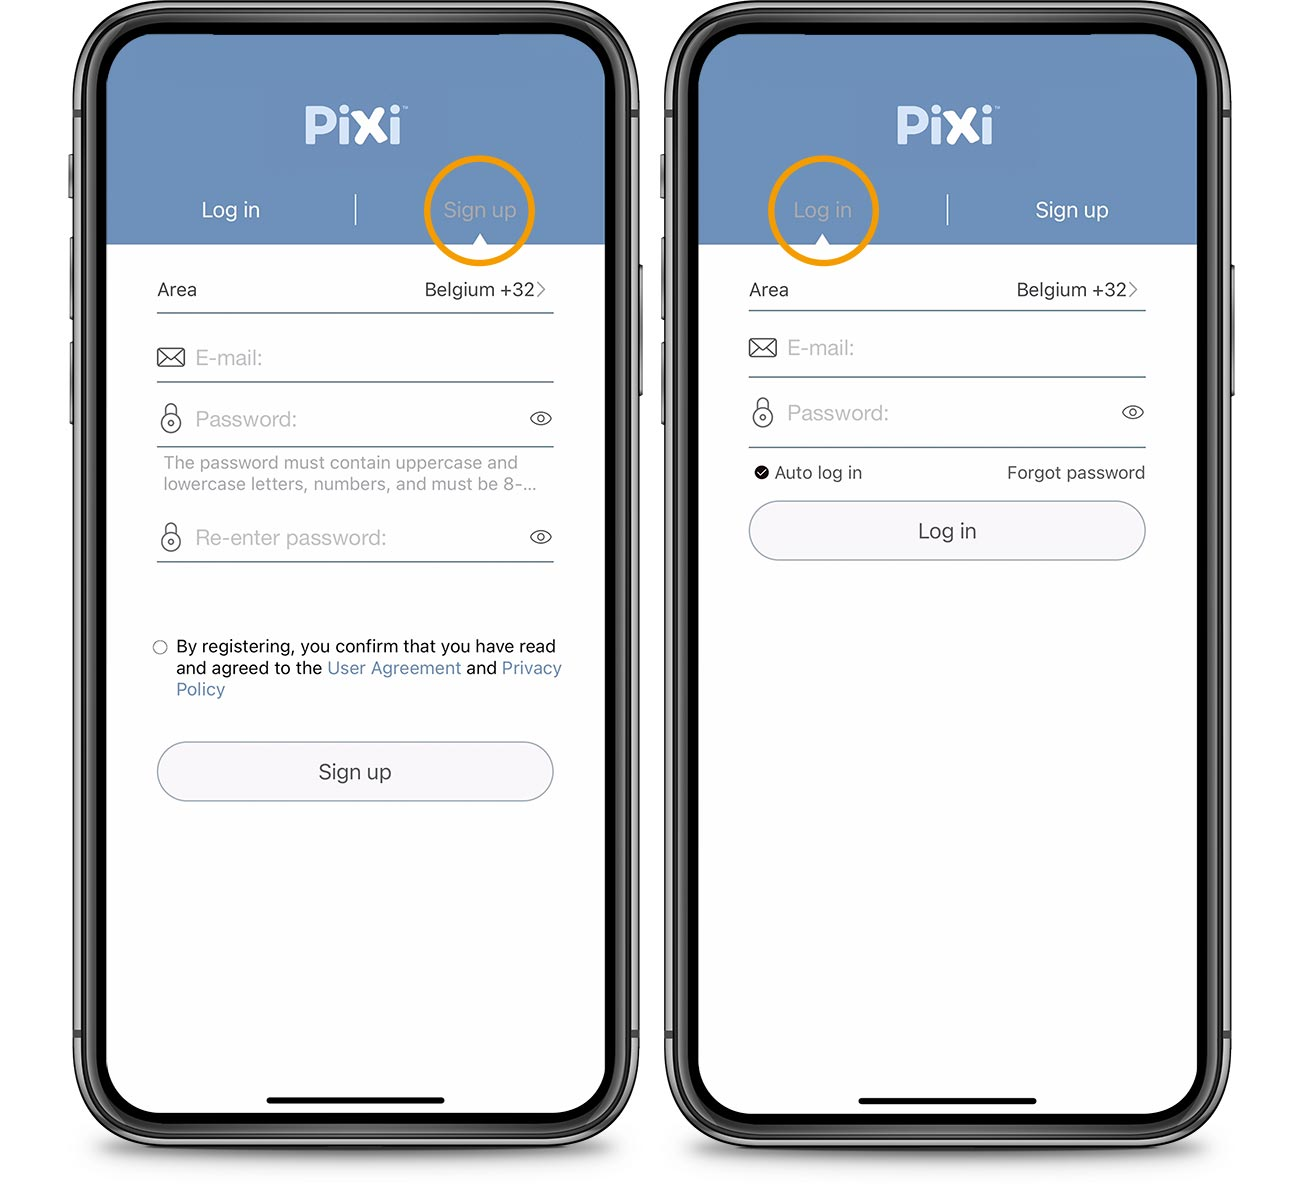 PIXI App Log in Sign up